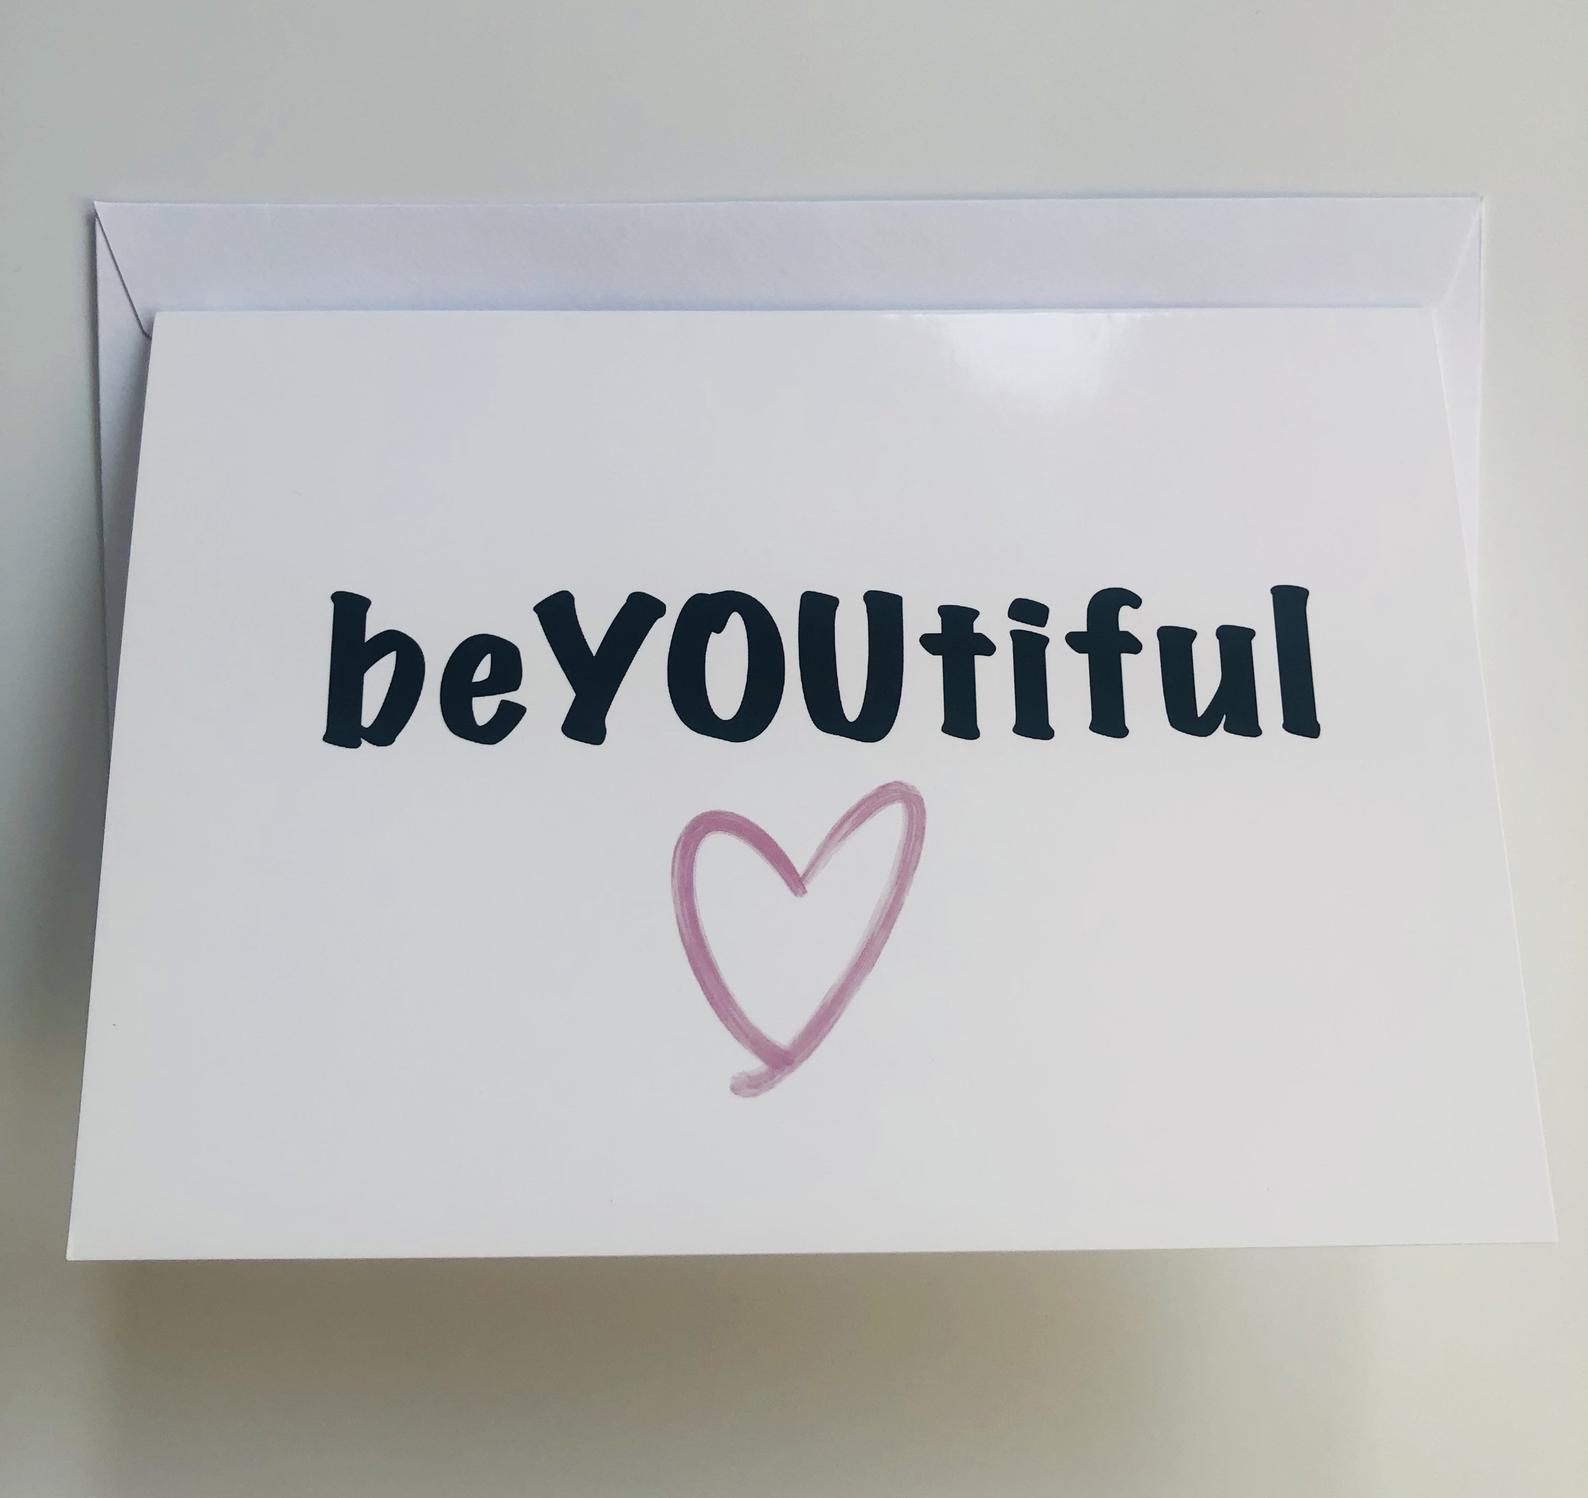 beyoutiful